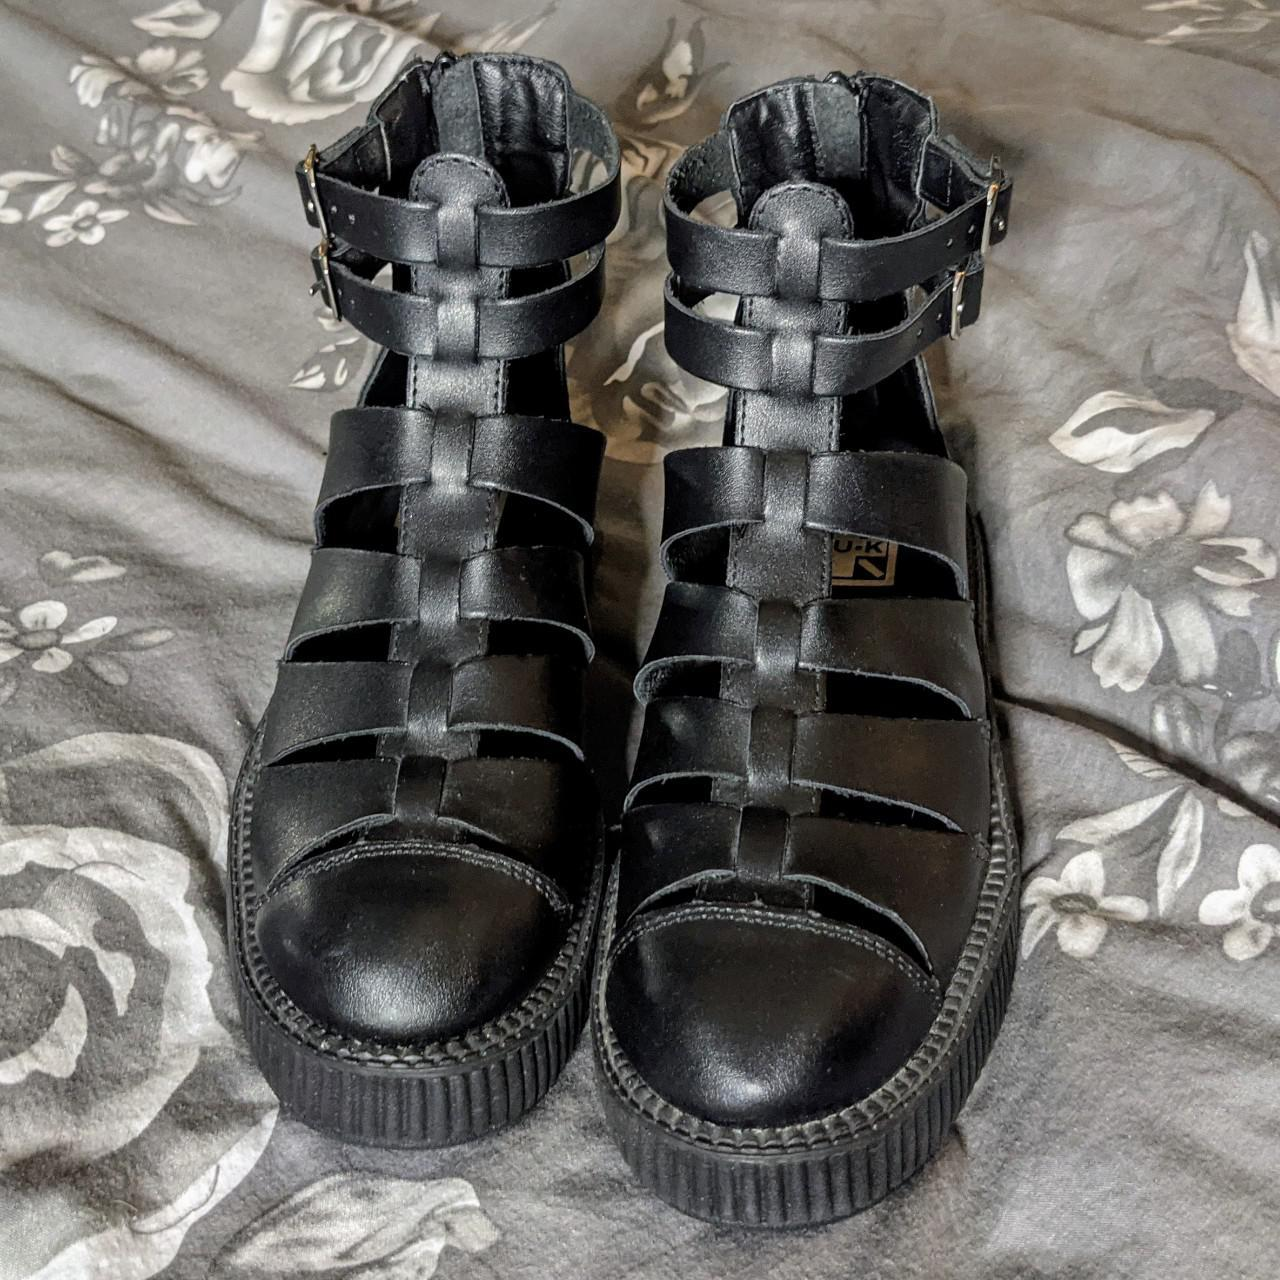 Product Image 1 - 💀T.U.K. Gladiator Sandals!💀 ▪Brand: T.U.K.